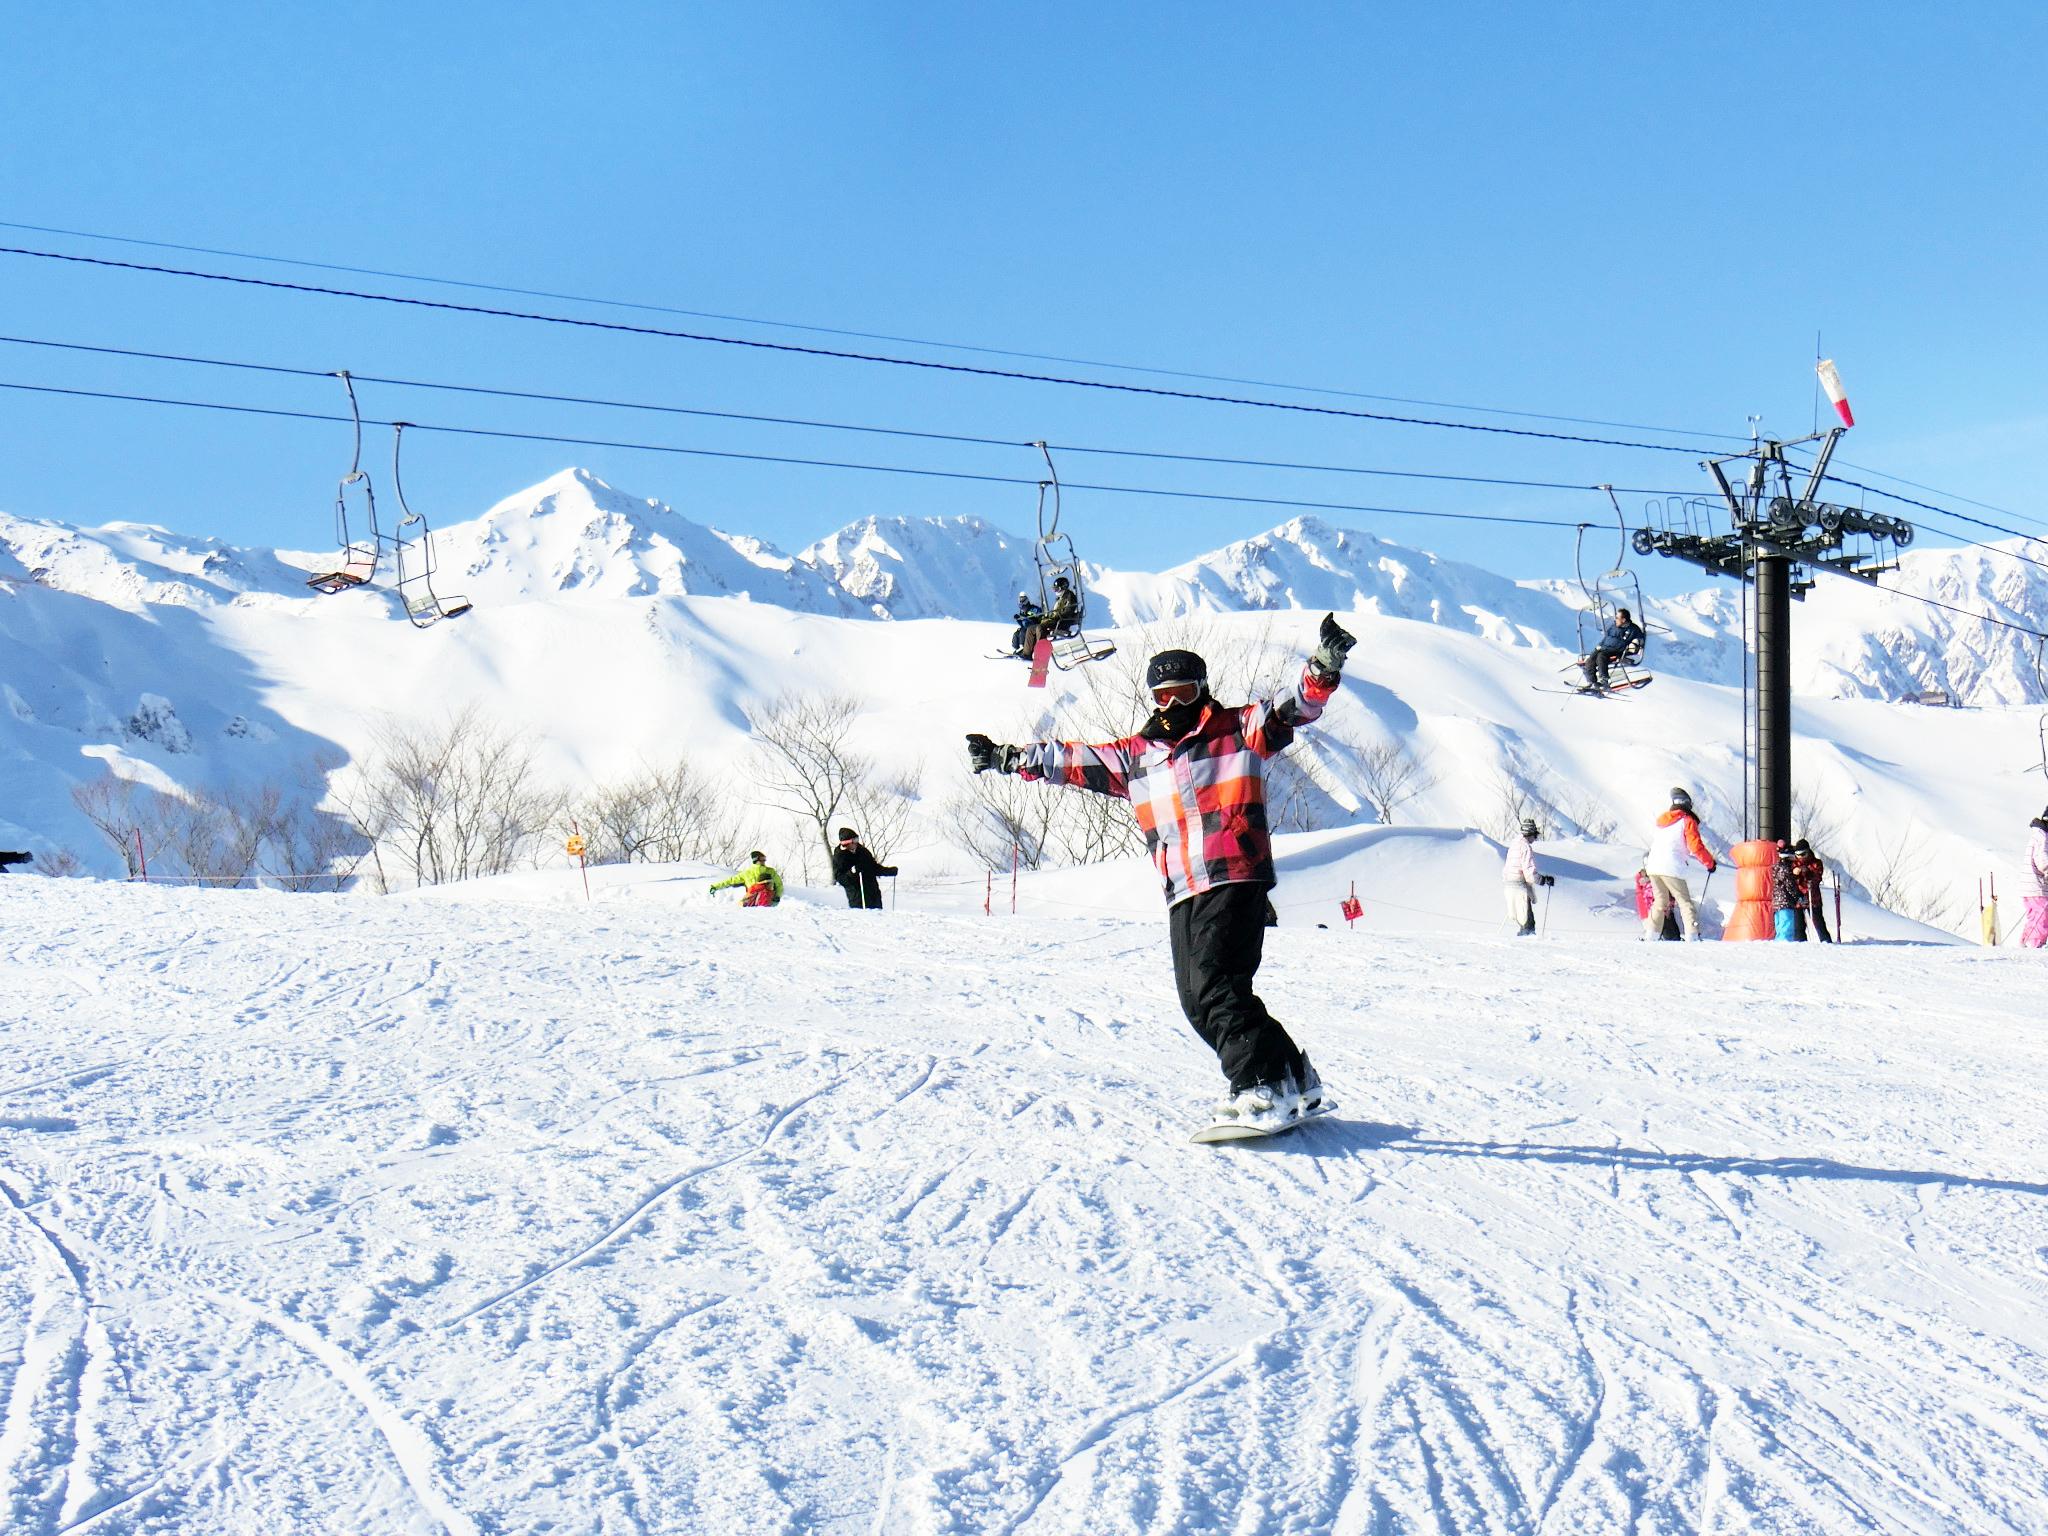 Ski season all rooms with bathroom (December 1 - March 31)